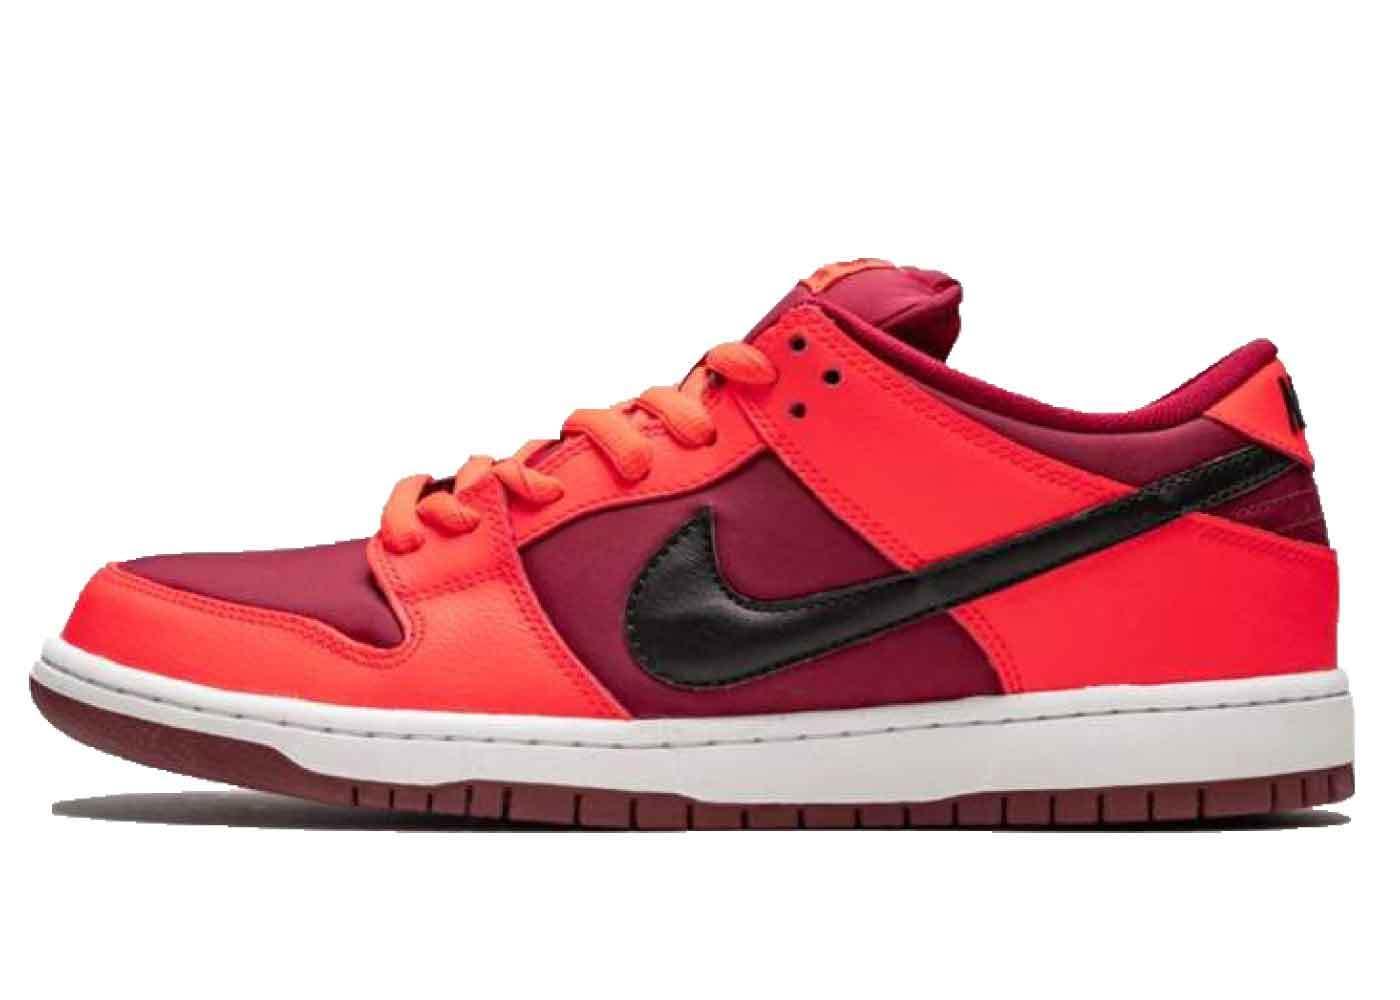 Nike SB Dunk Low Laser Crimsonの写真